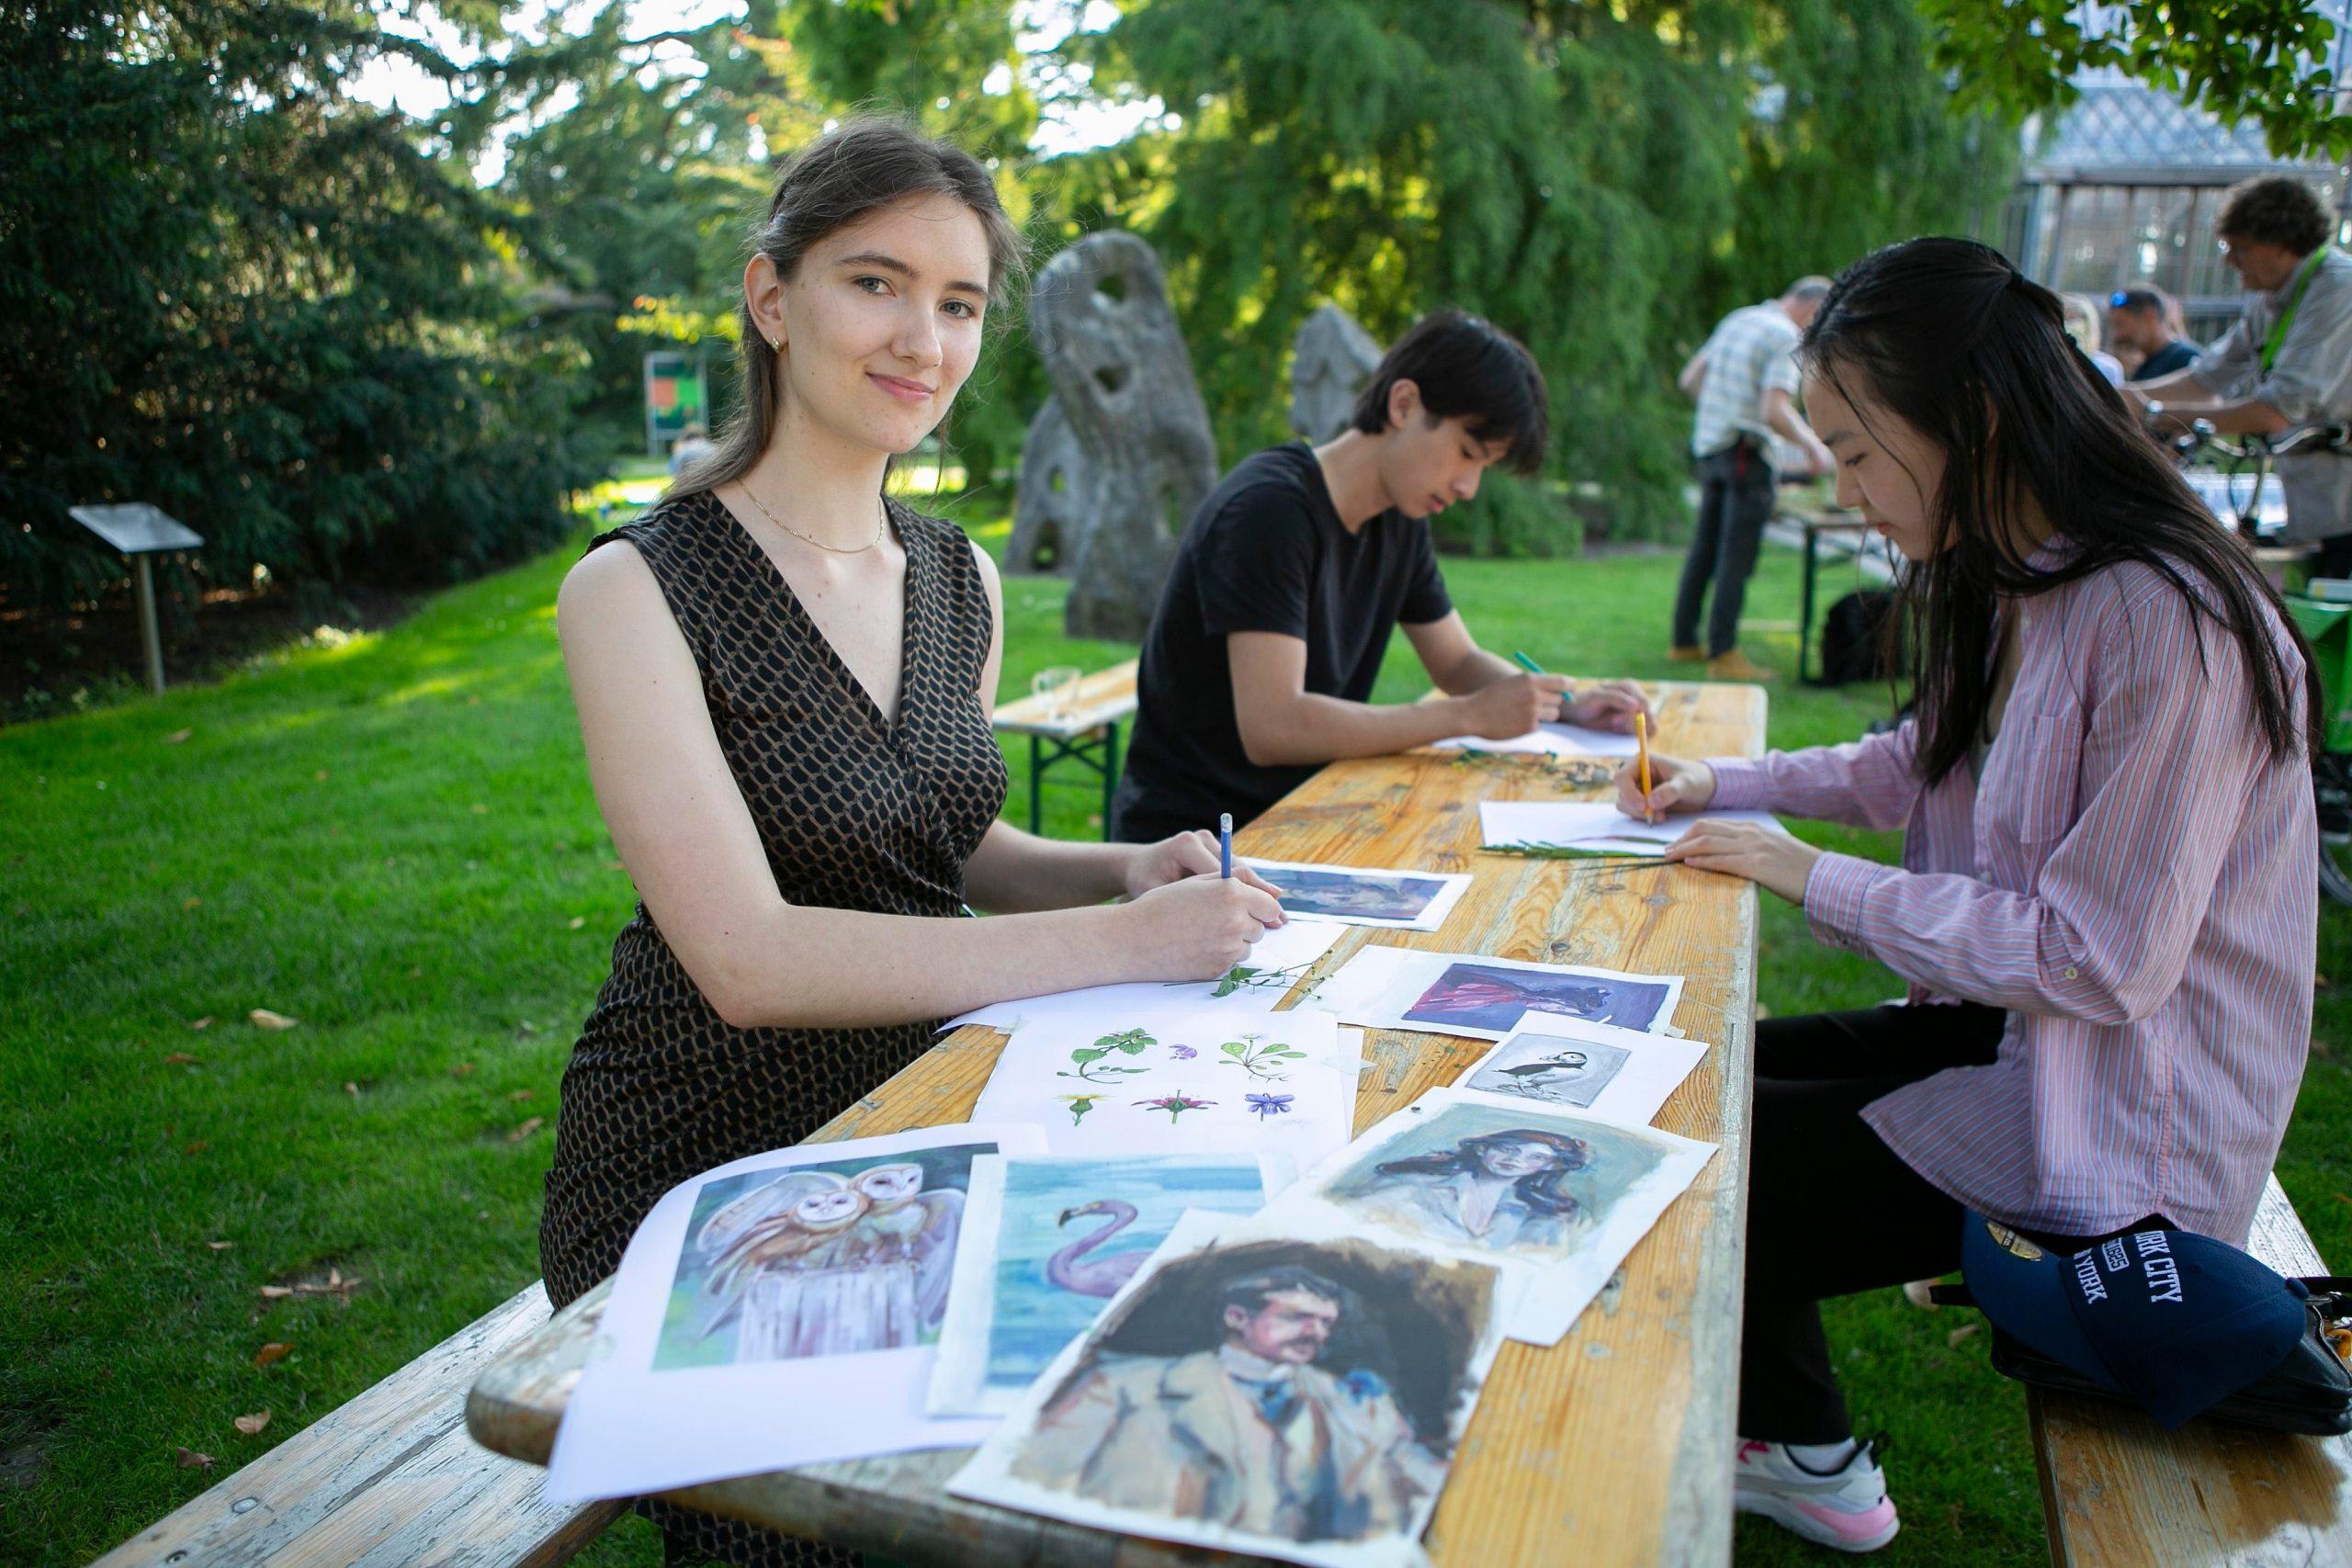 Livia Pietro has a creative and educational summer job at…